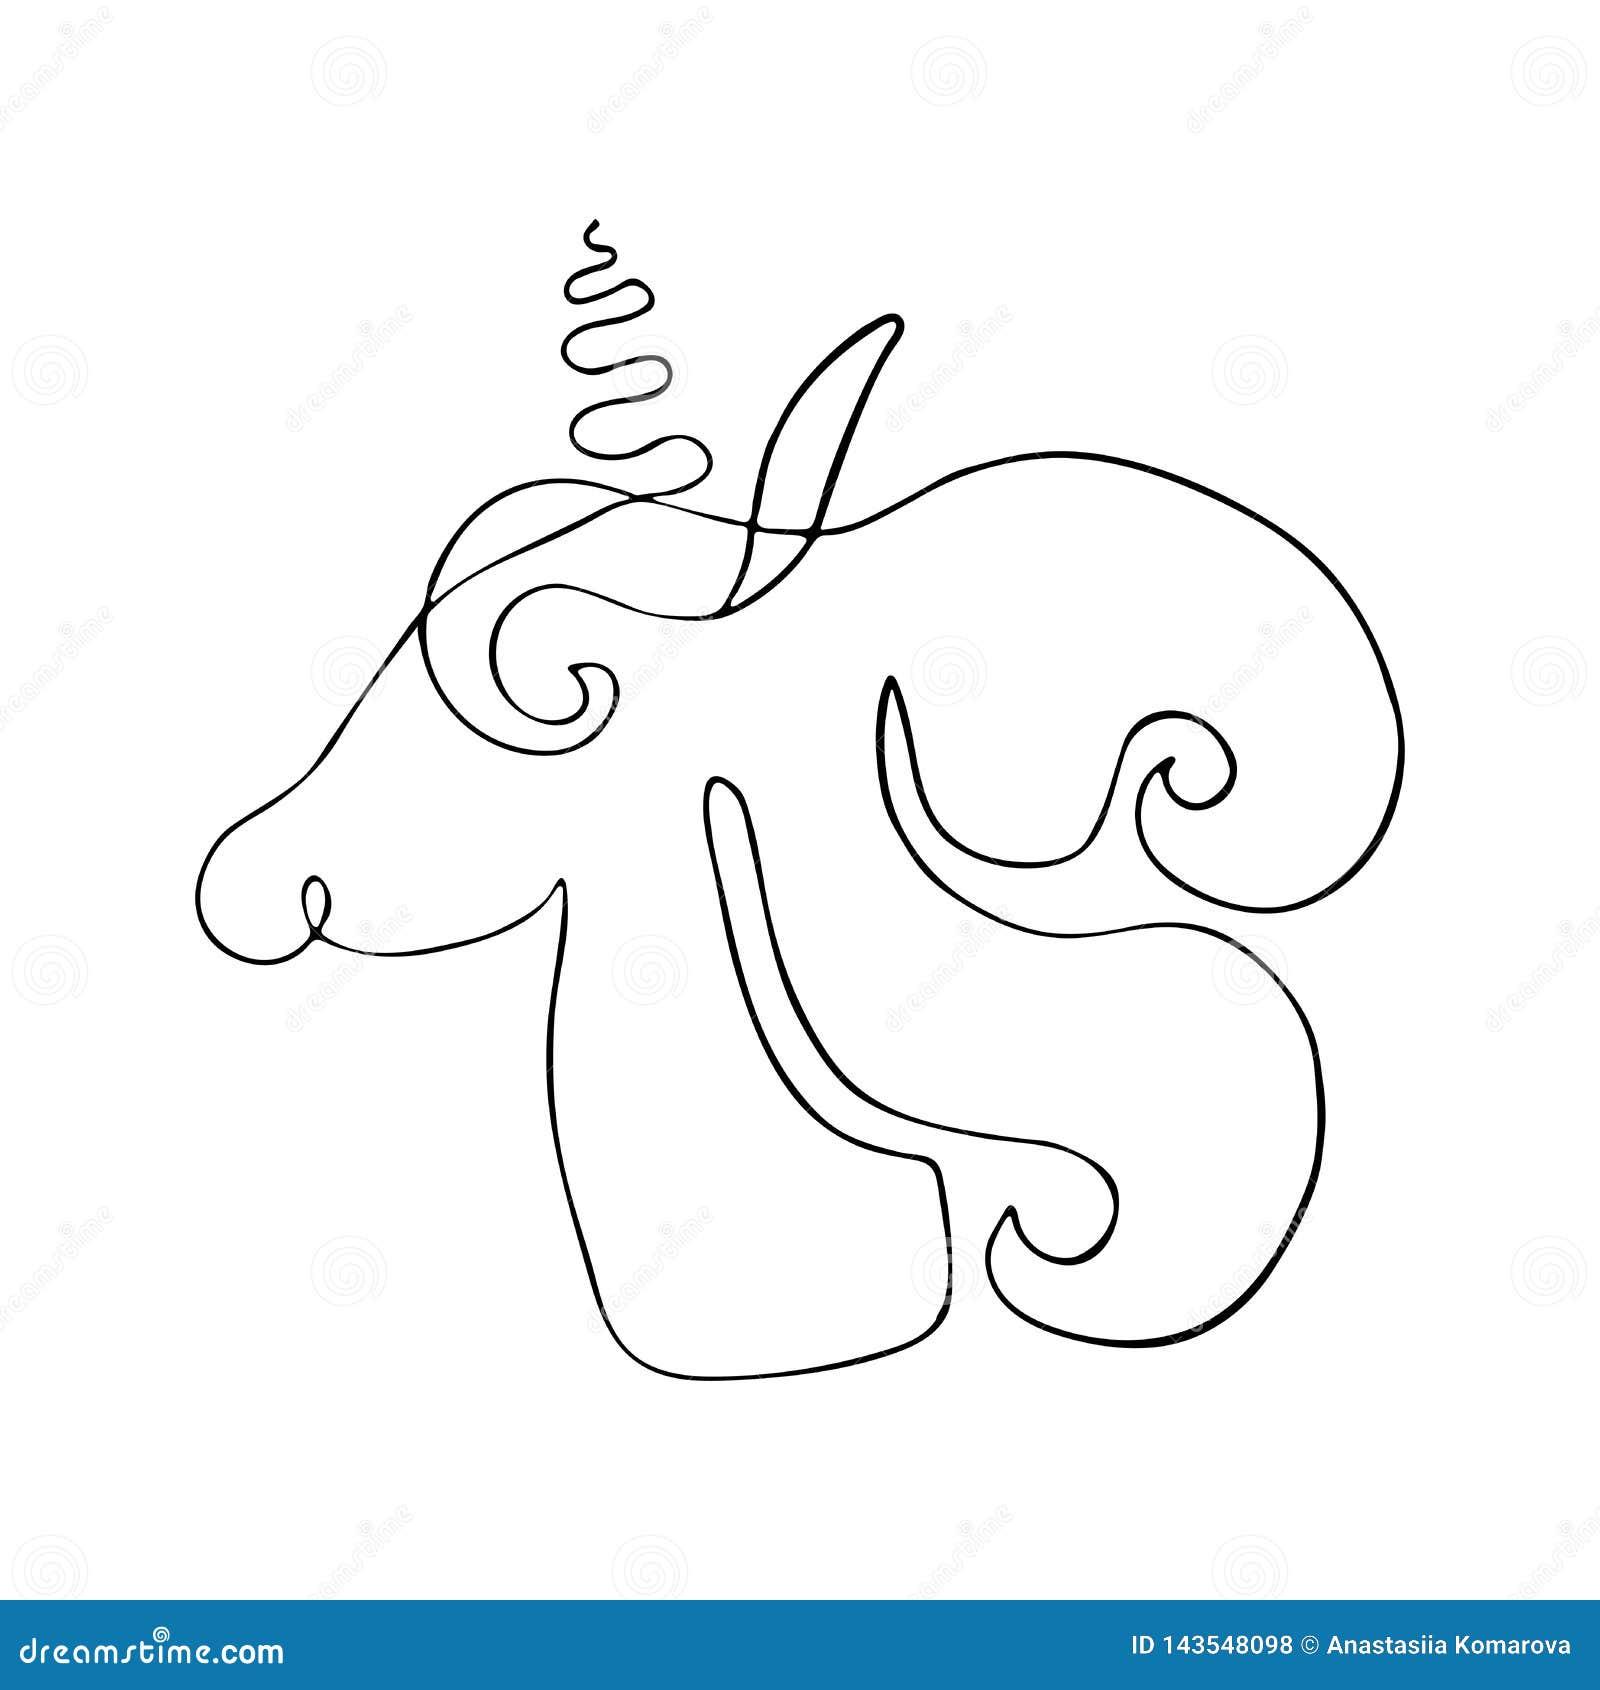 Dibujo de esquema de unicornios Silueta linear de la criatura fant?stica, animal m?stico